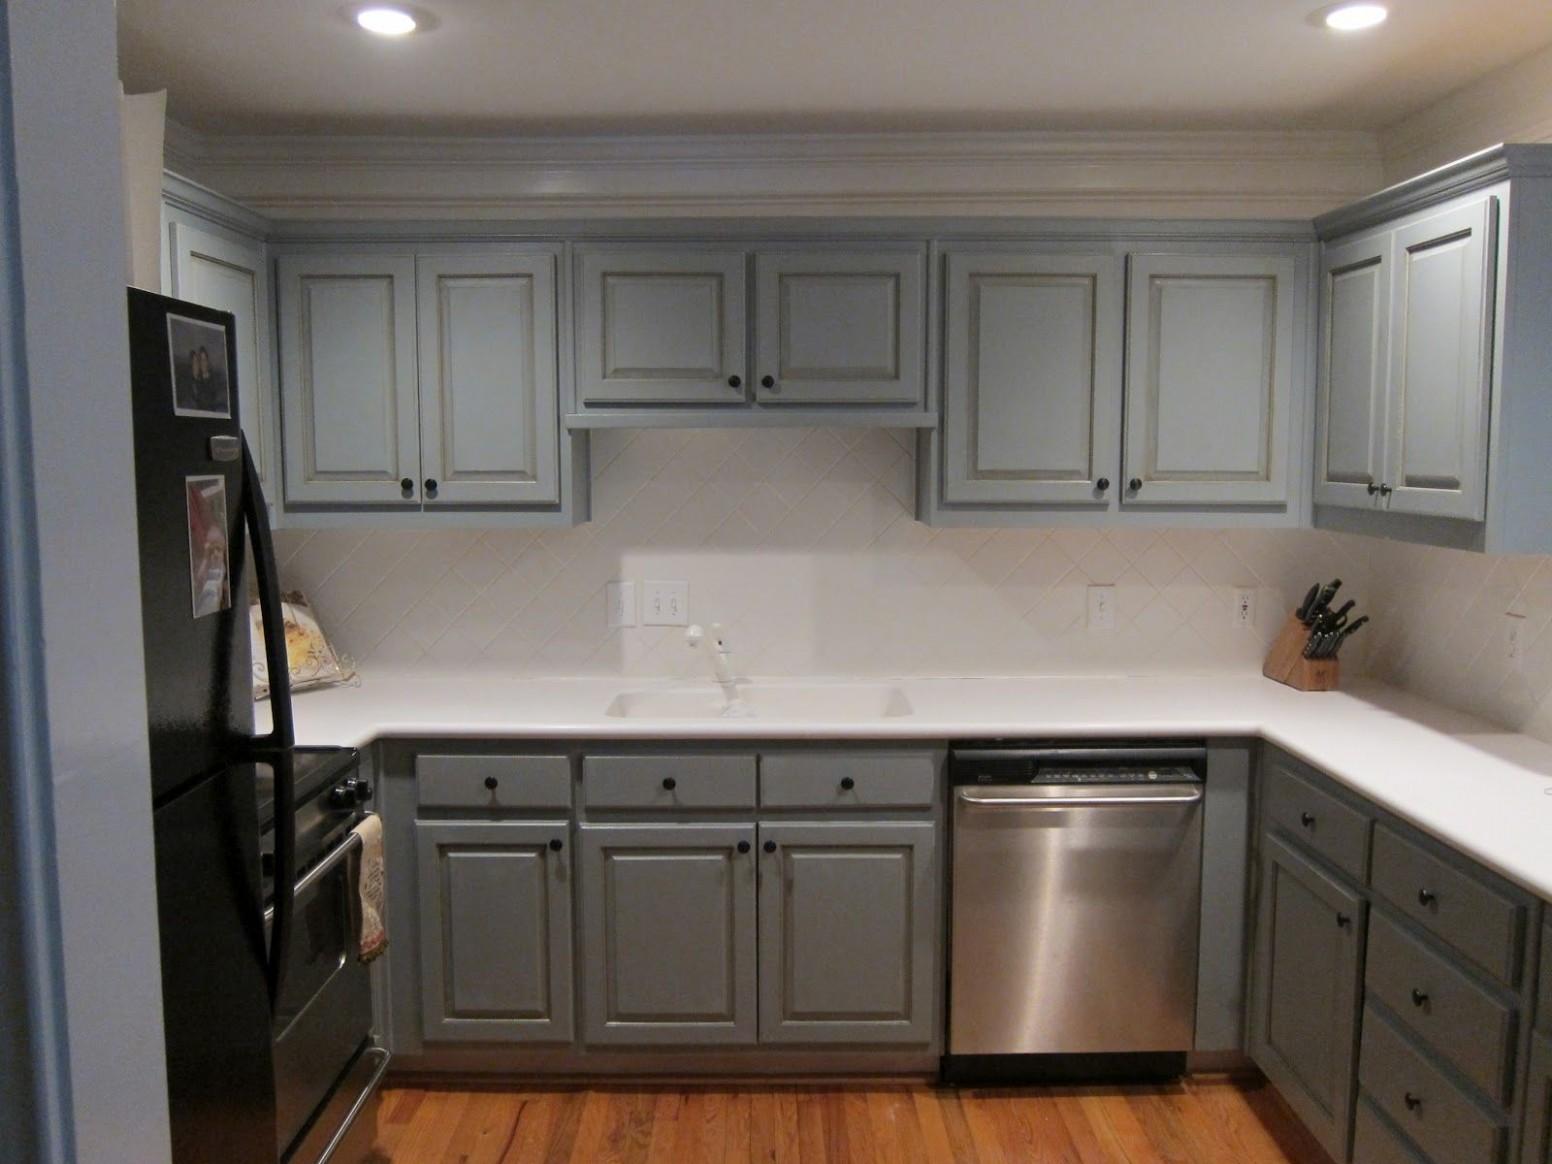 Product Review: RustOleum Cabinet Transformations  Rustoleum  - Rustoleum Kitchen Cabinet Paint Kit Reviews